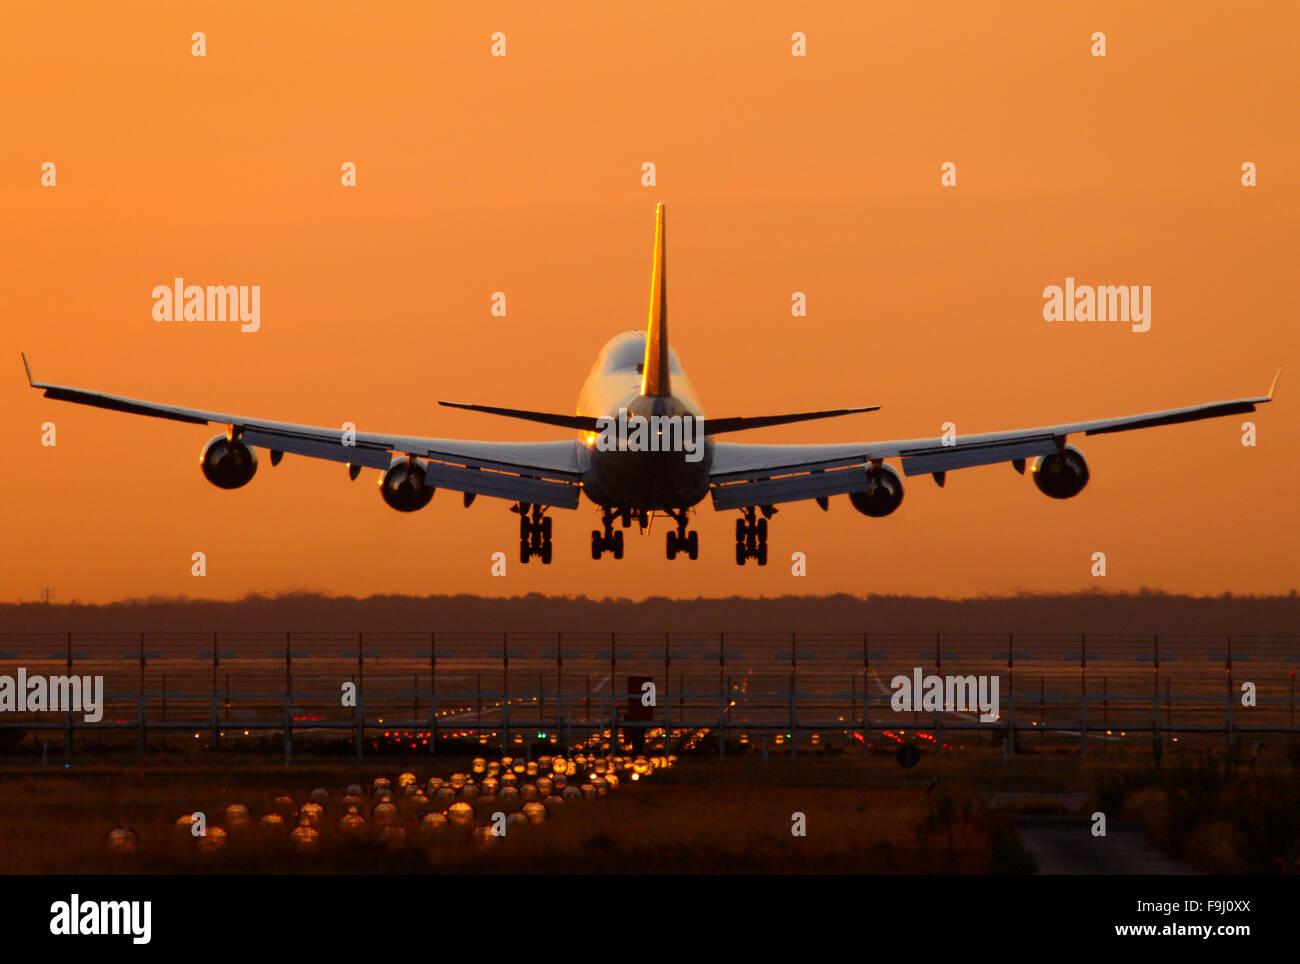 Lufthansa Boeing 747-400 Landing in Early Morning Light - Stock Image